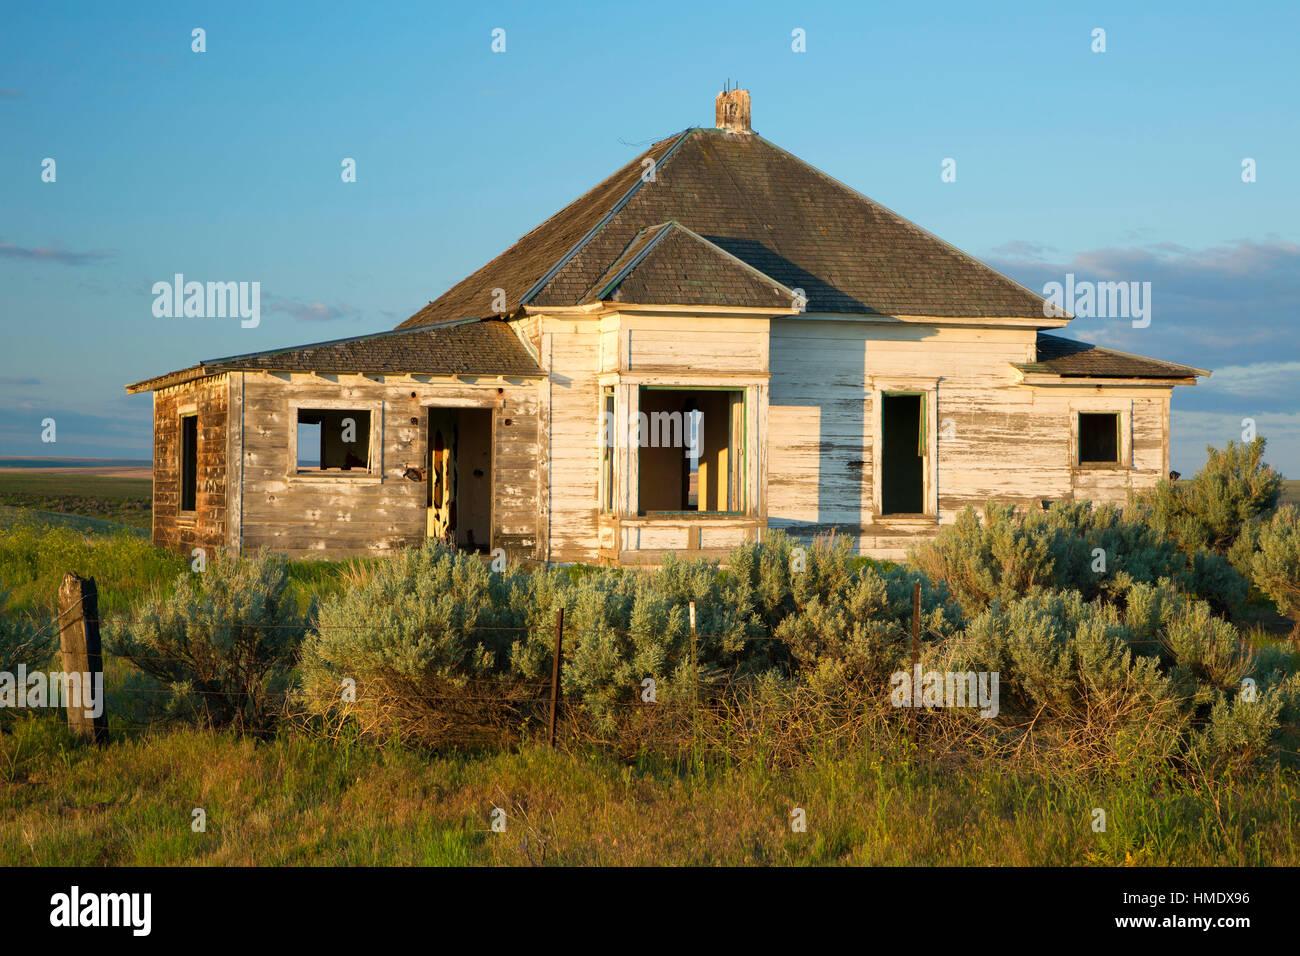 Abandoned homestead, Gilliam County, Oregon - Stock Image